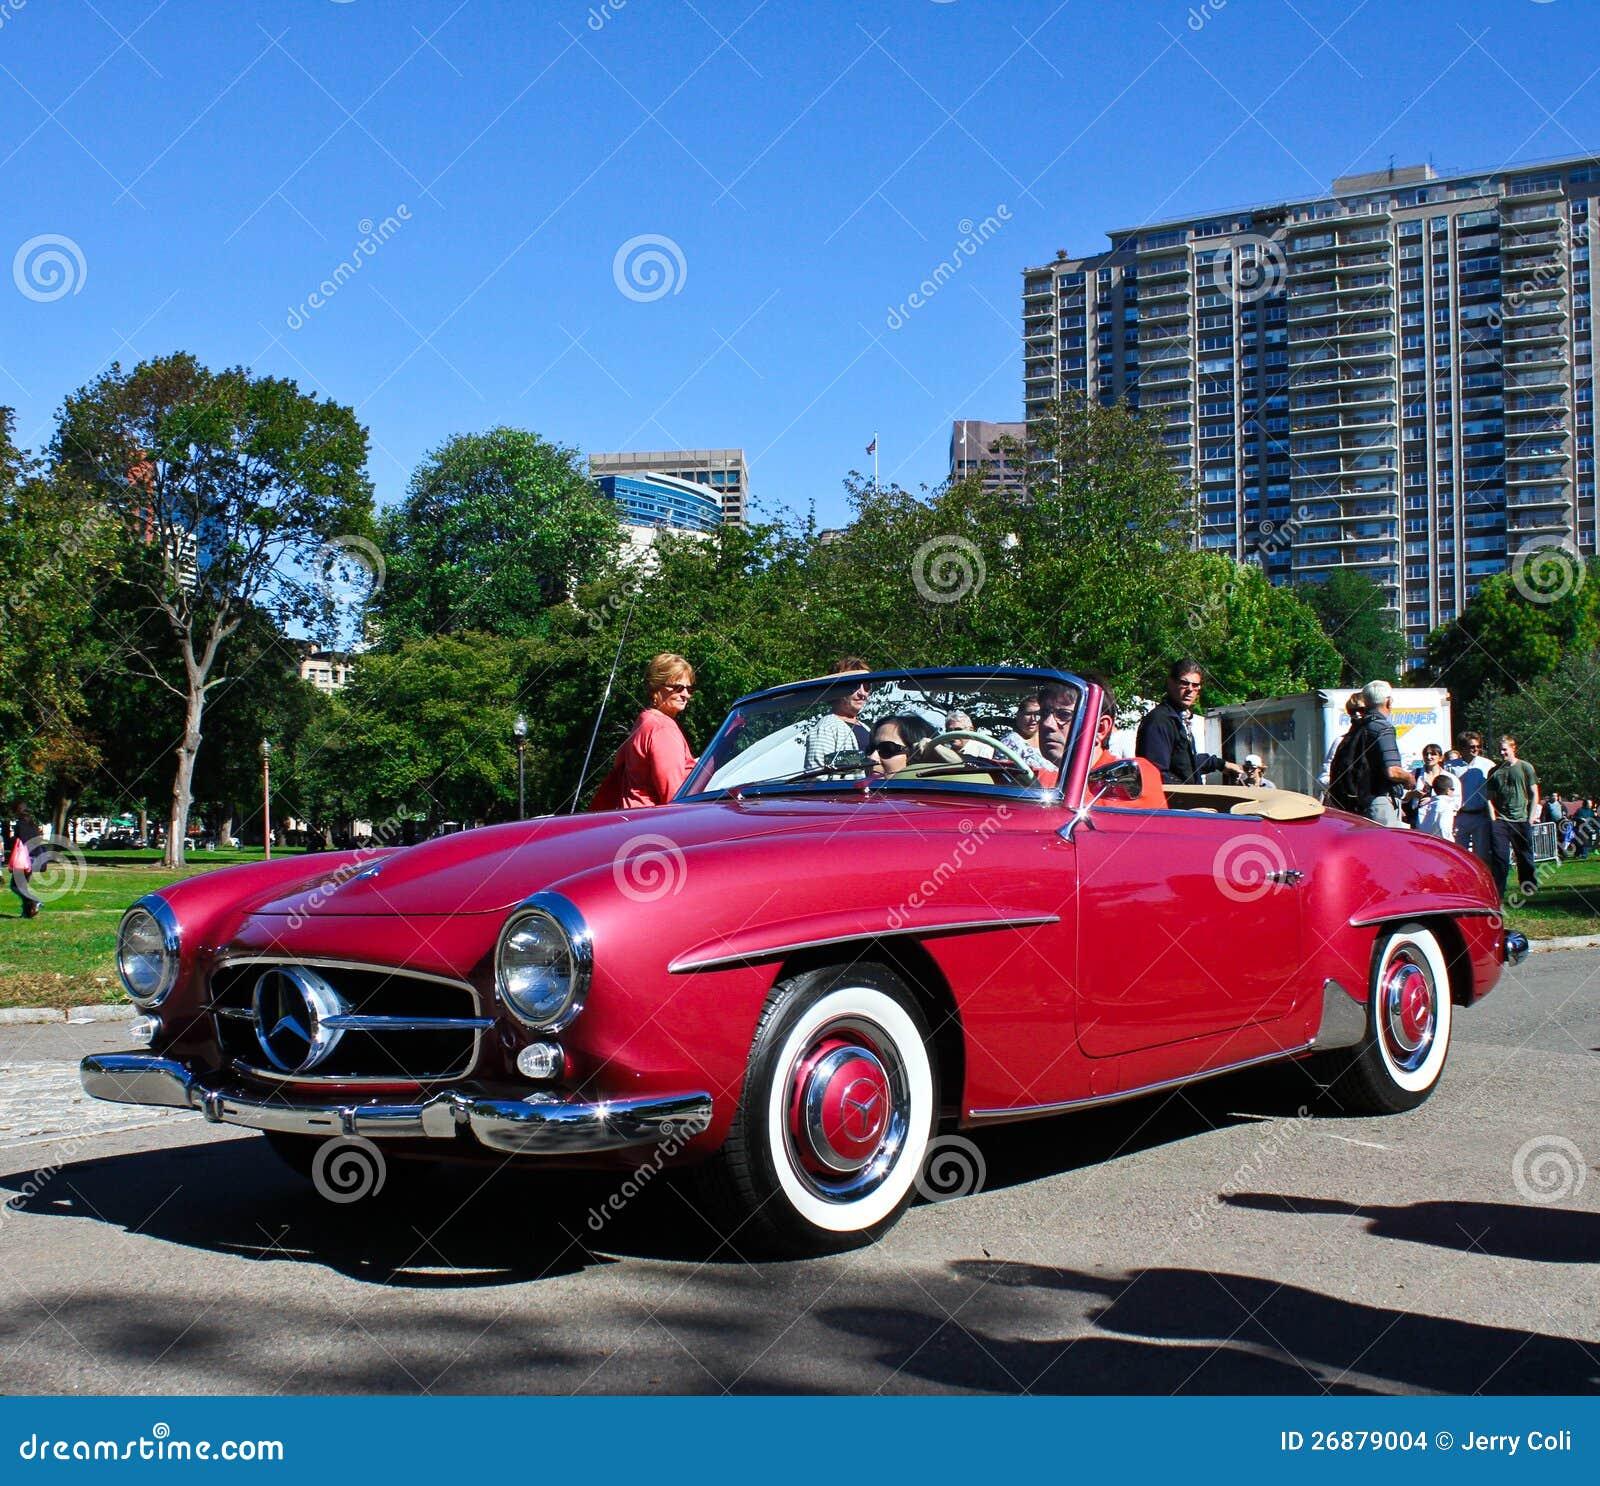 Vintage mercedes benz convertible editorial stock image for Classic mercedes benz convertible